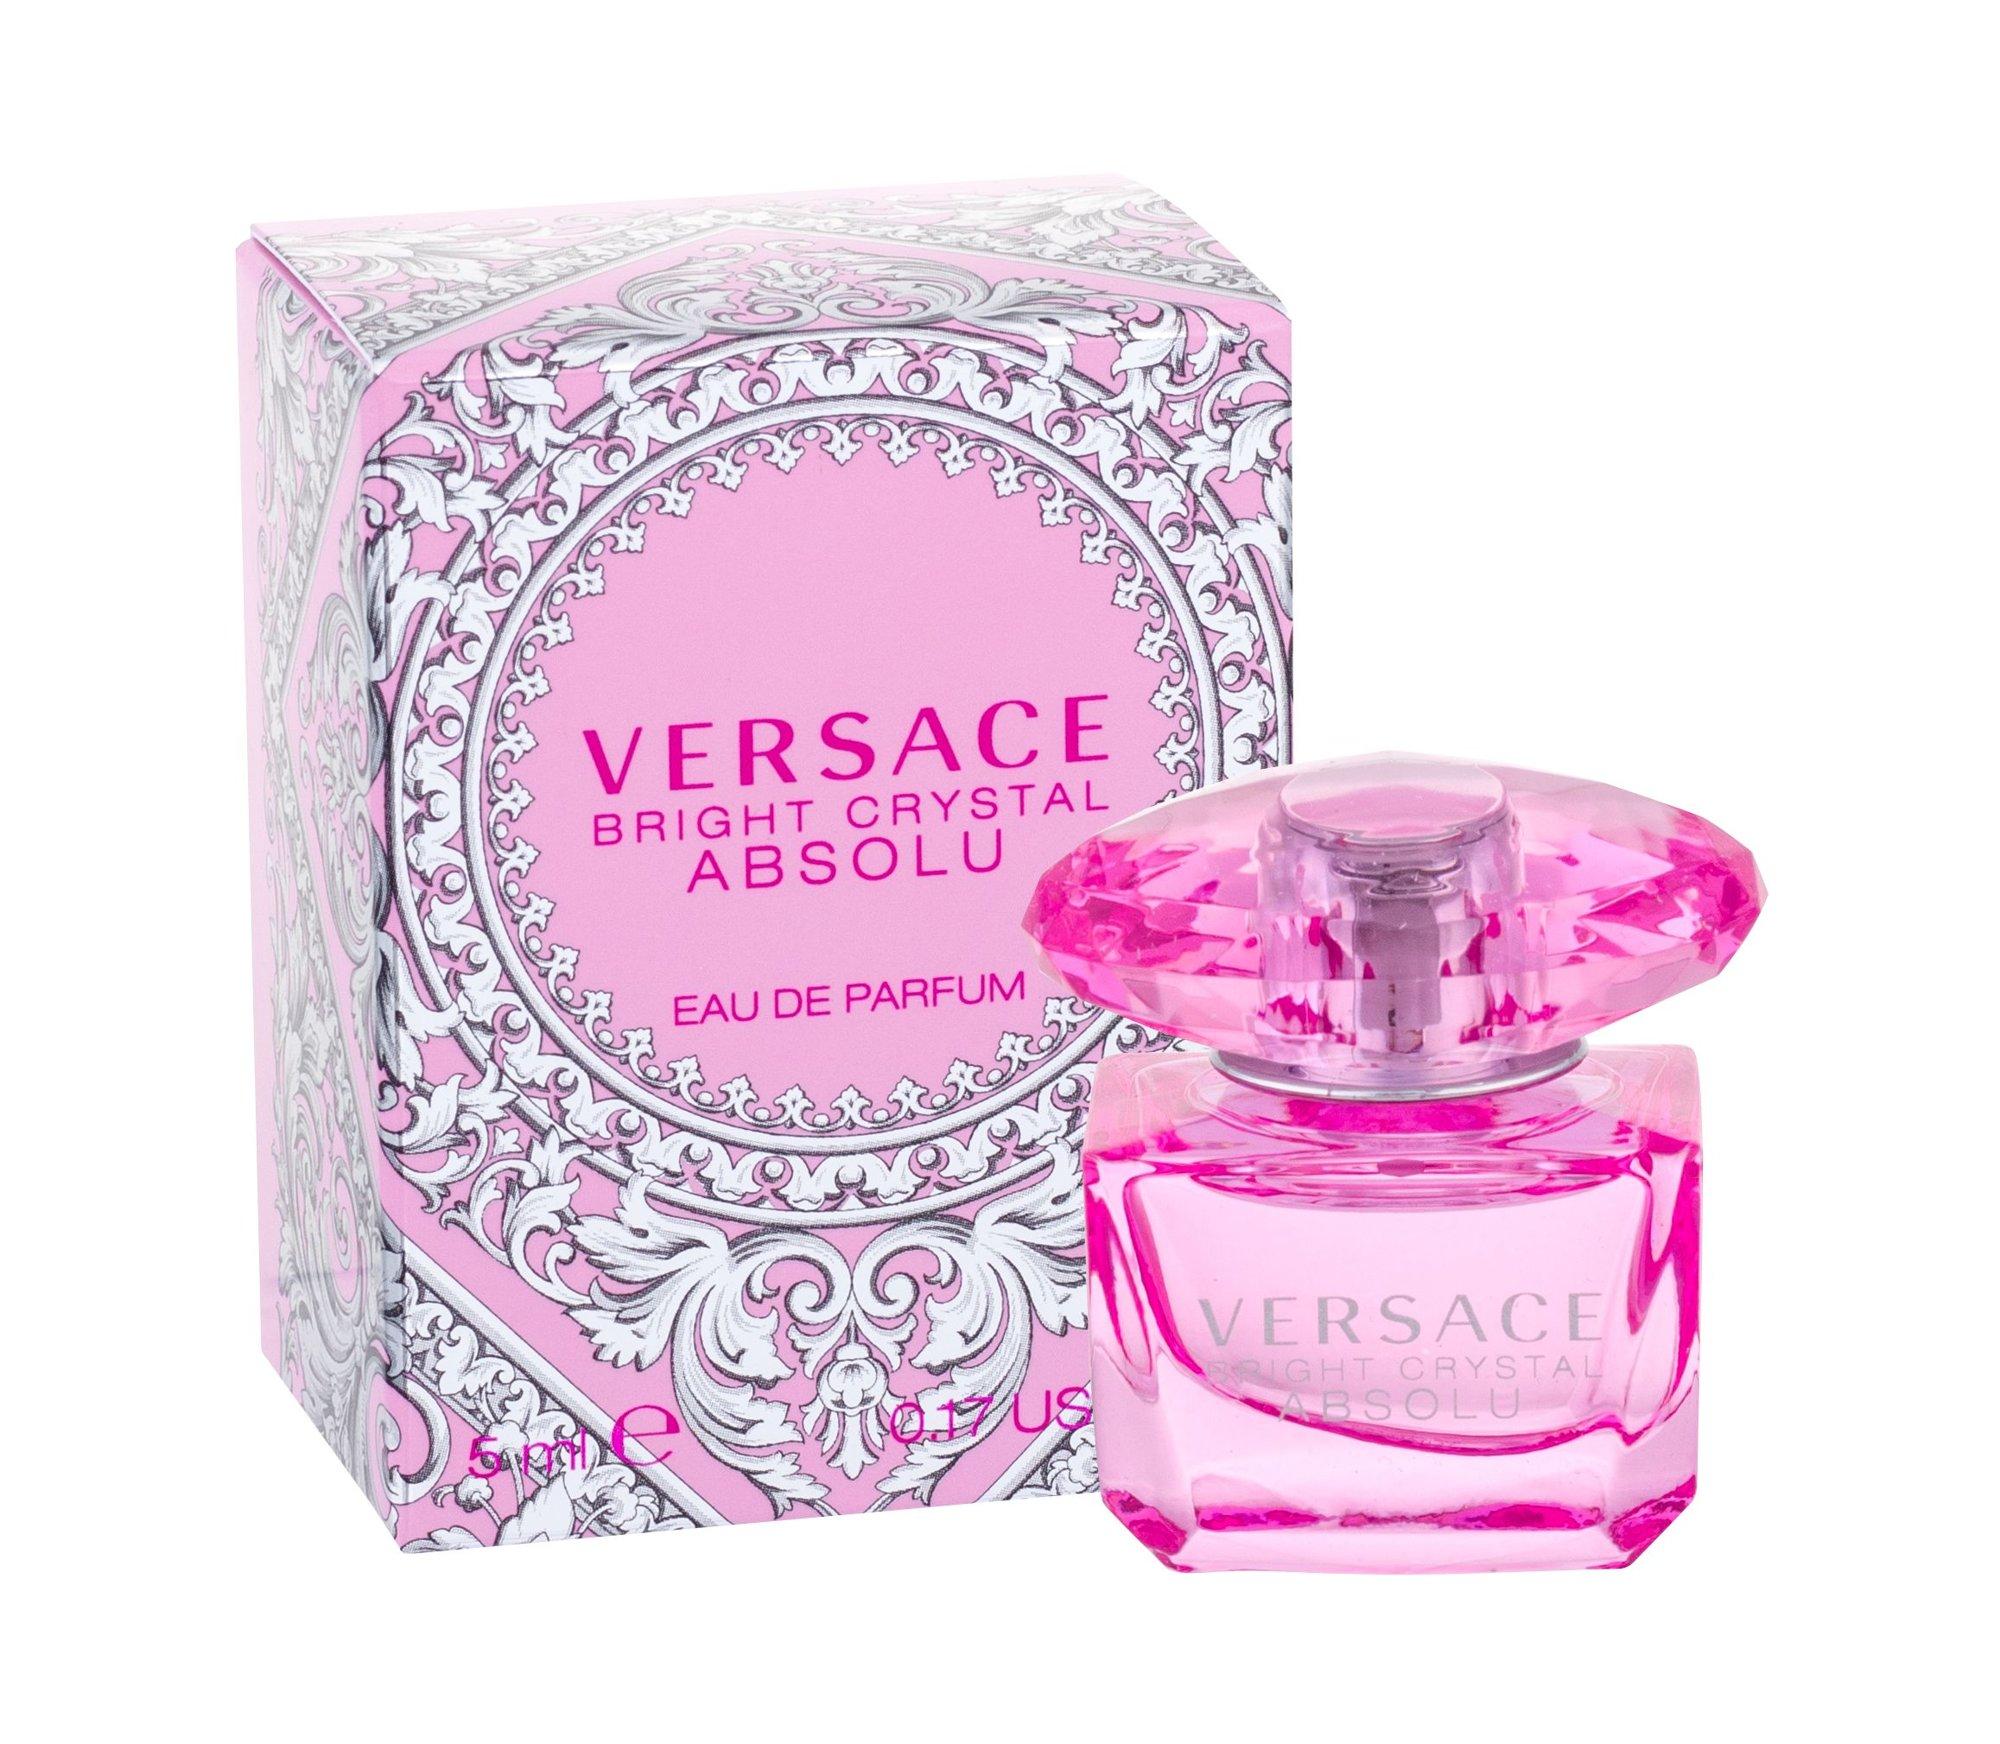 Versace Bright Crystal Absolu, Parfumovaná voda 5ml